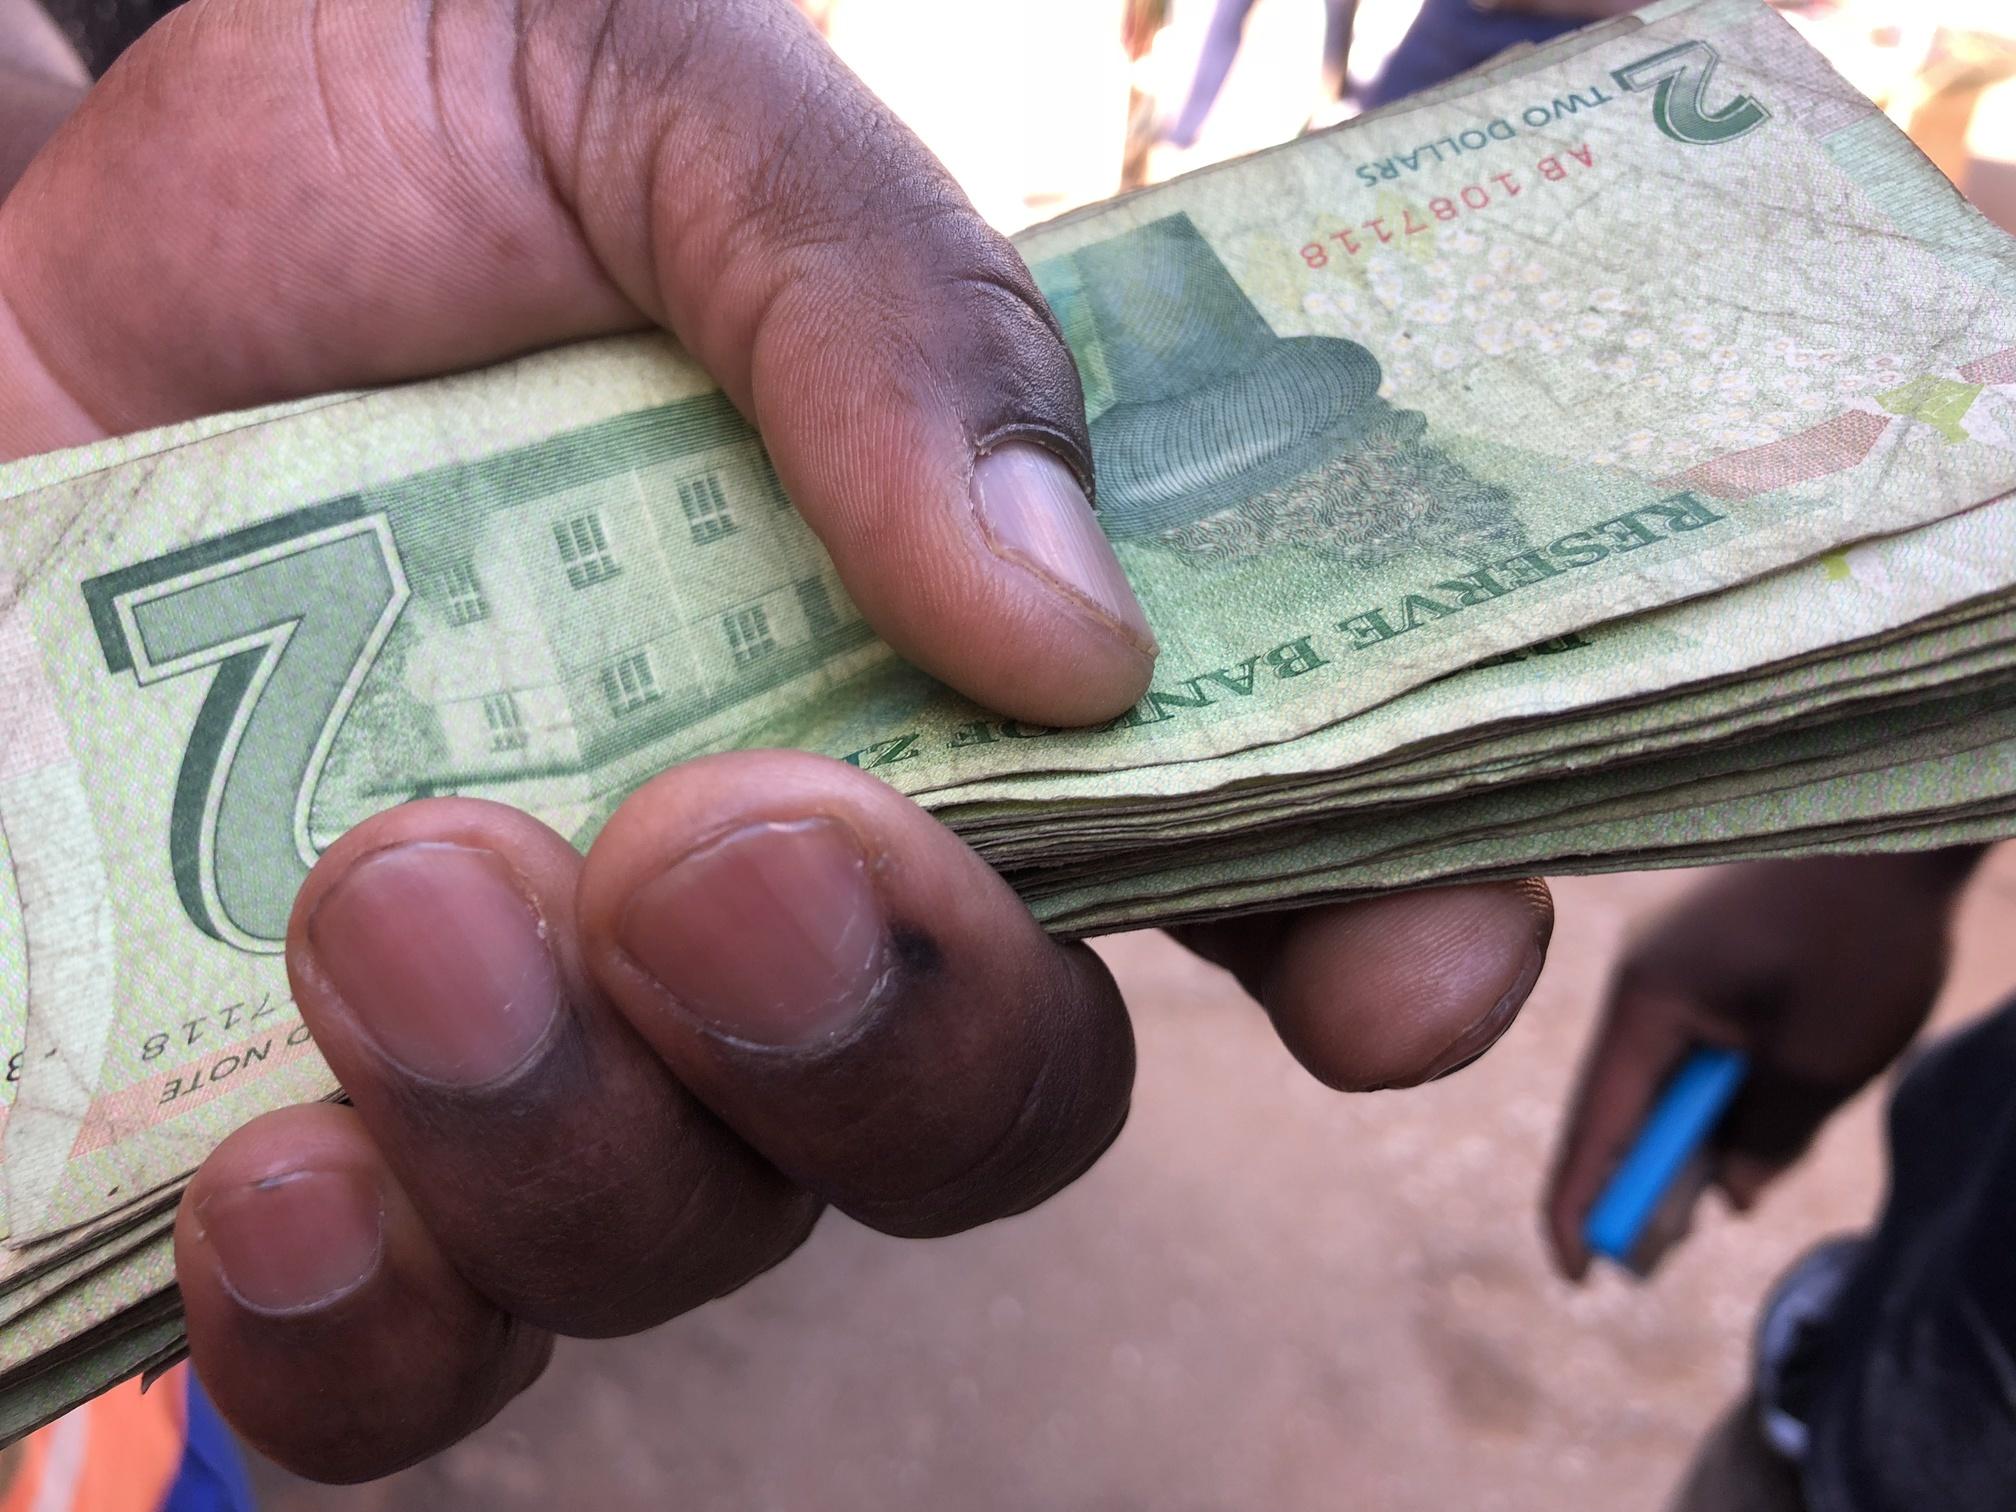 Photo Of Zimbabwe Bond Notes Being Exchanged